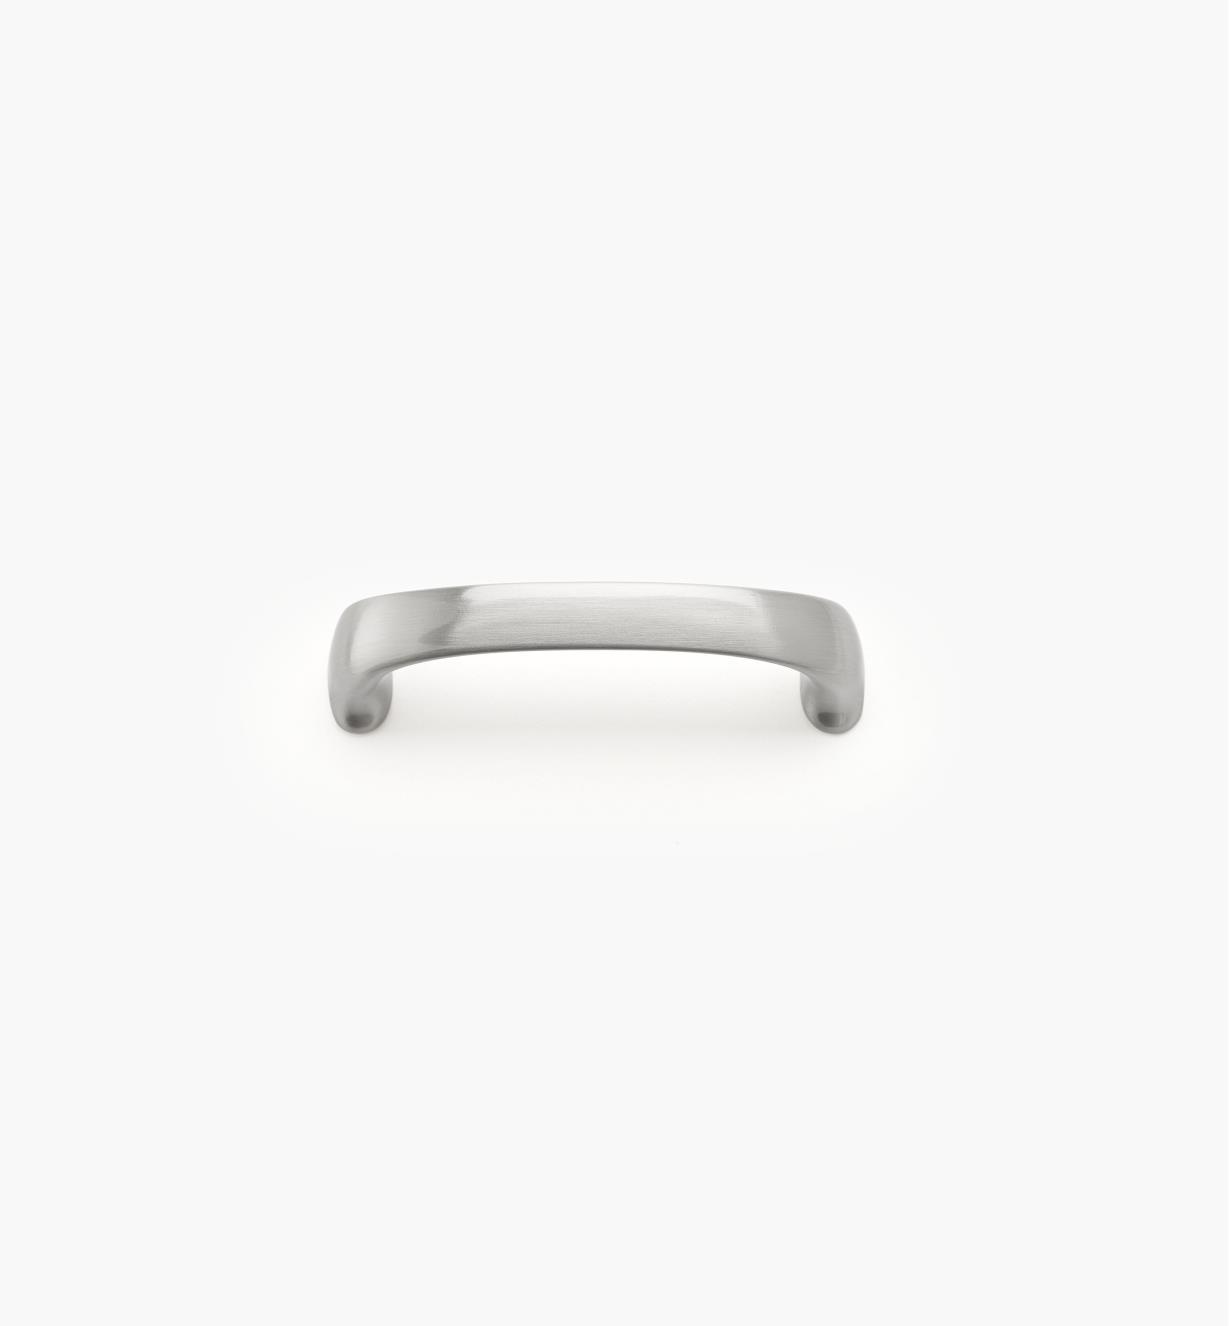 02A4313 - Poignée moderne arrondie, fini nickel satiné, 3 po